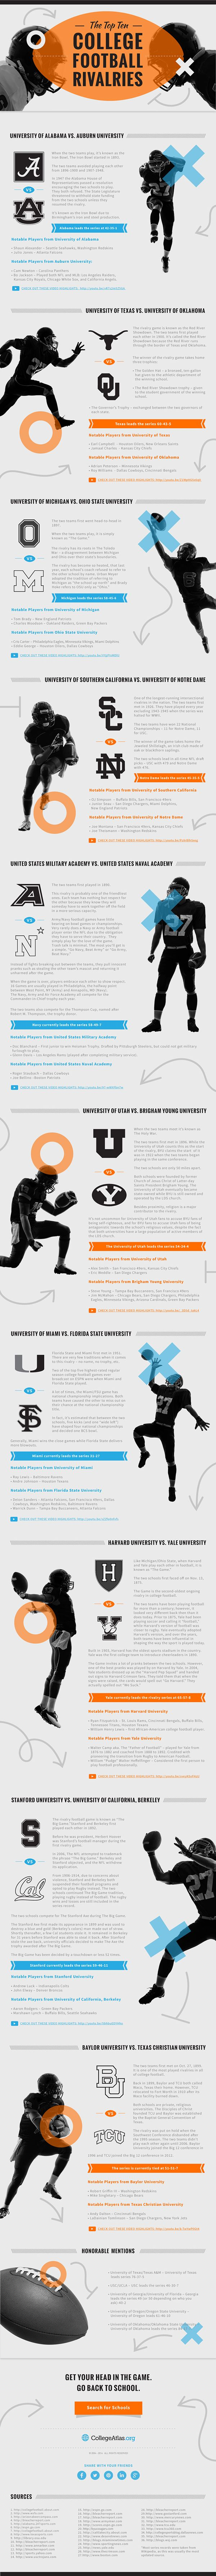 College Football Rivalries Infographic by Joshua Fowlke, via Behance